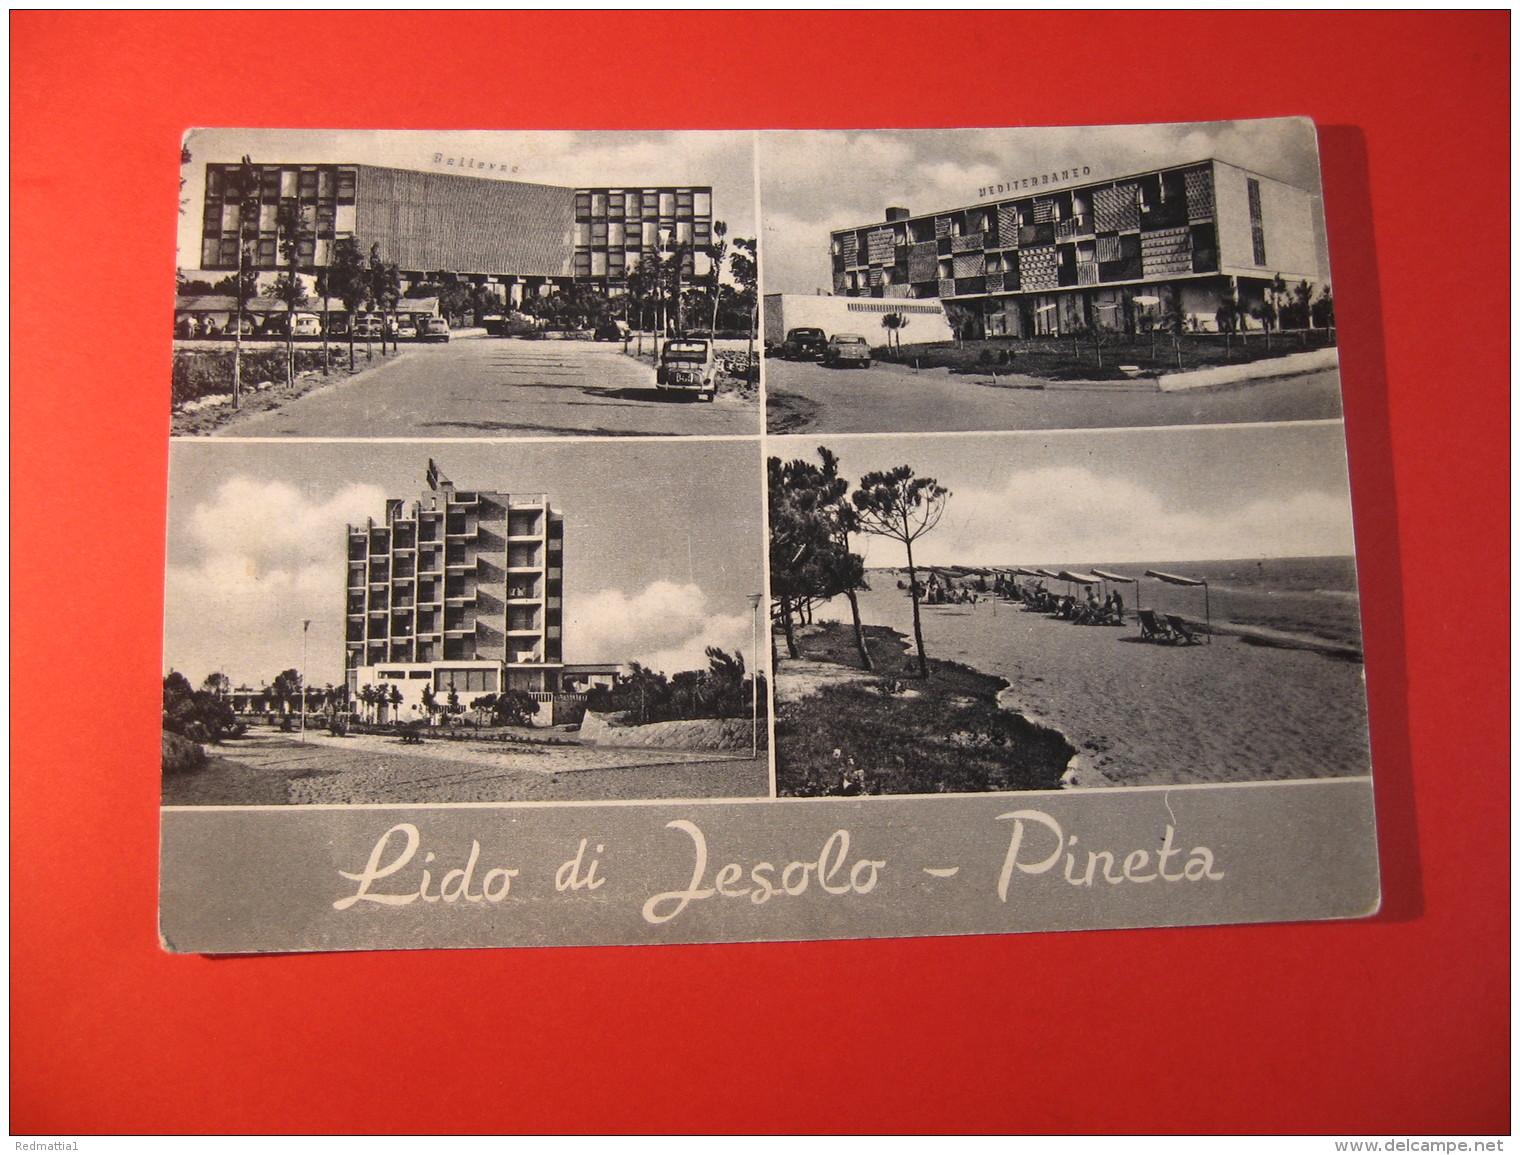 CARTOLINA   LIDO DI IESOLO   PINETA VEDUTINE    ANIMATA    D - 3874 - Venezia